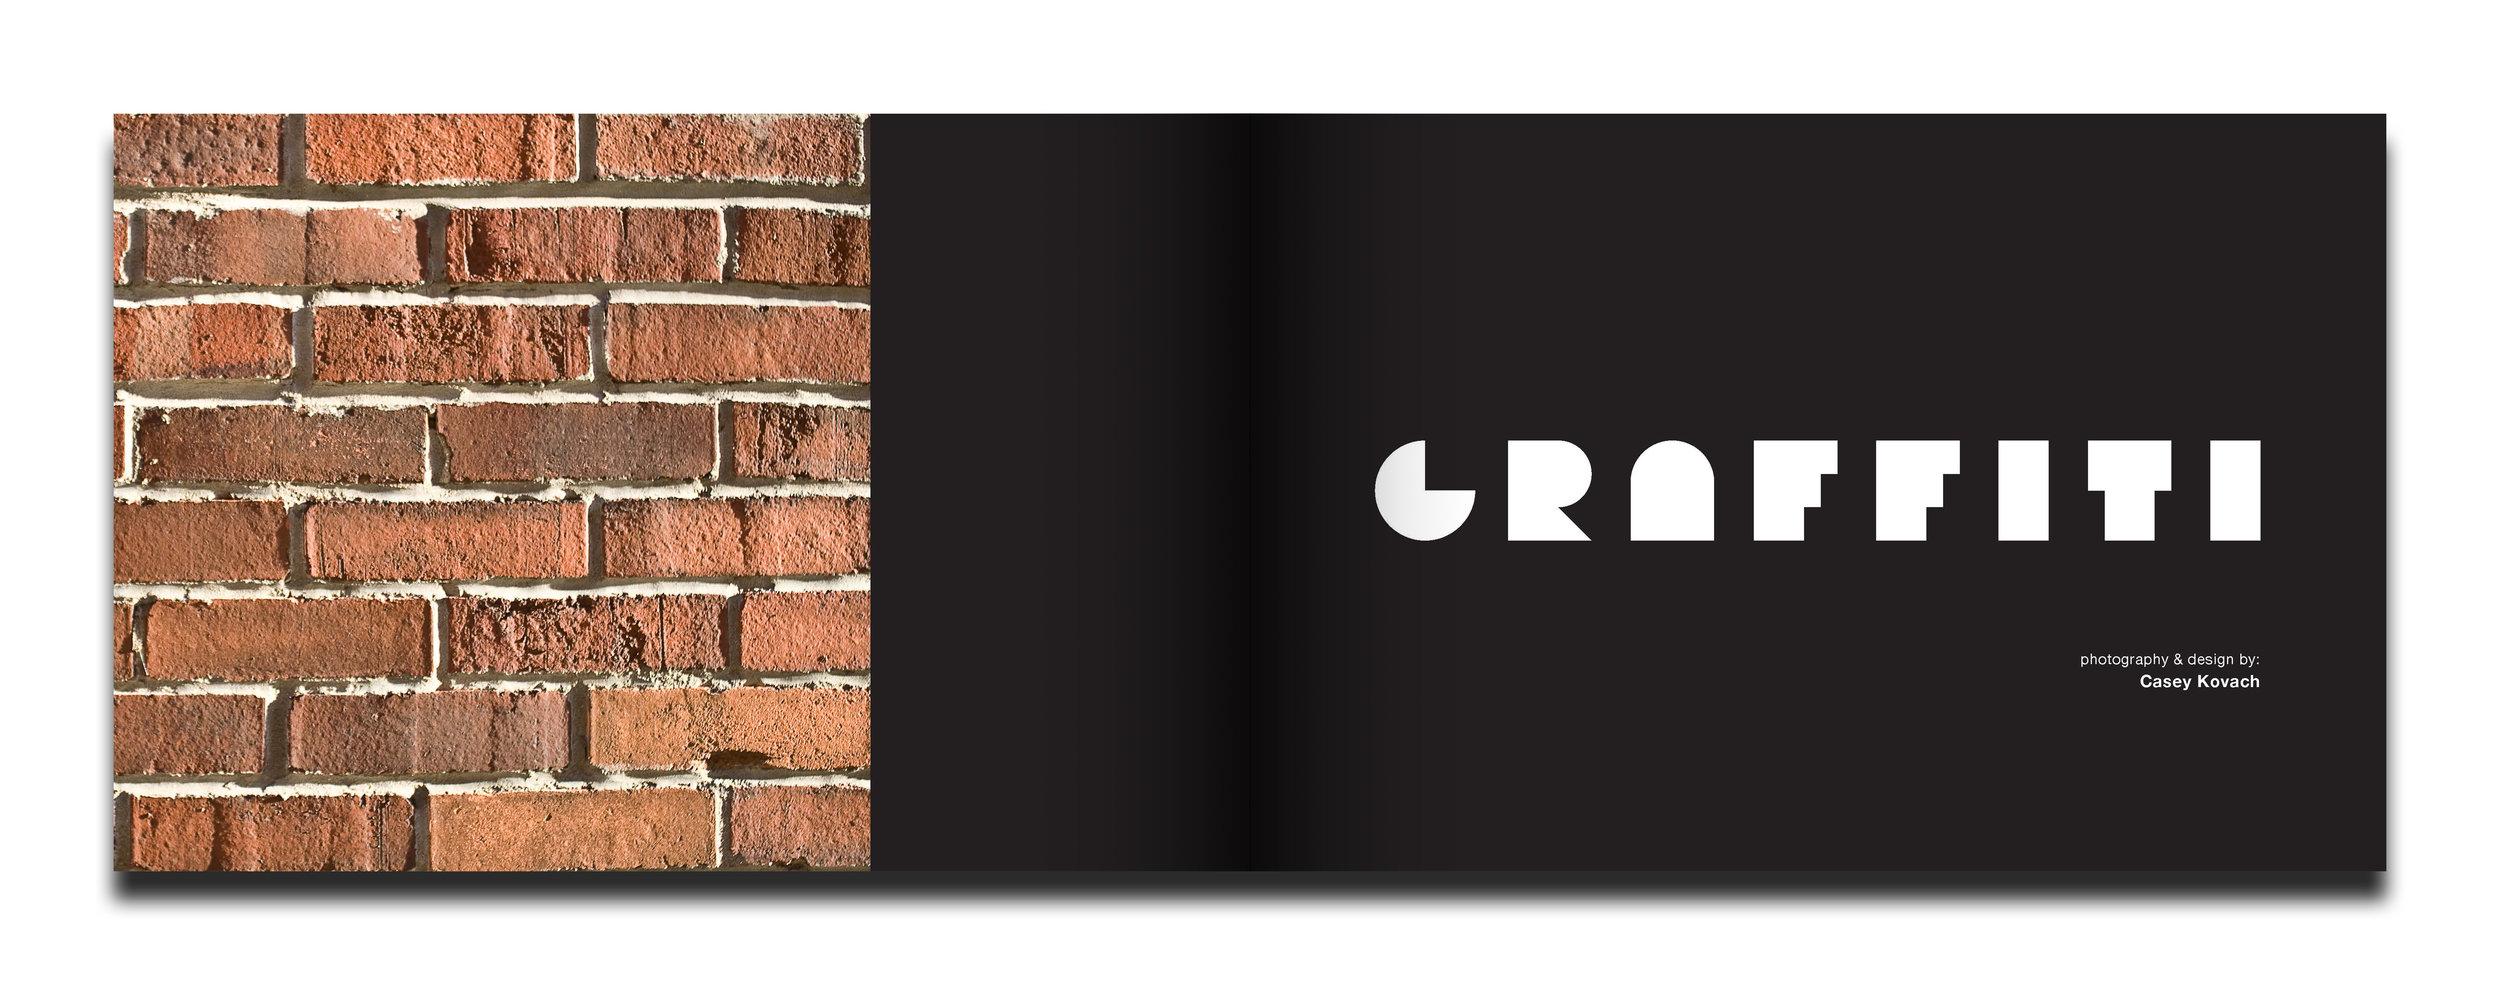 Graff_Book_Page_03.jpg